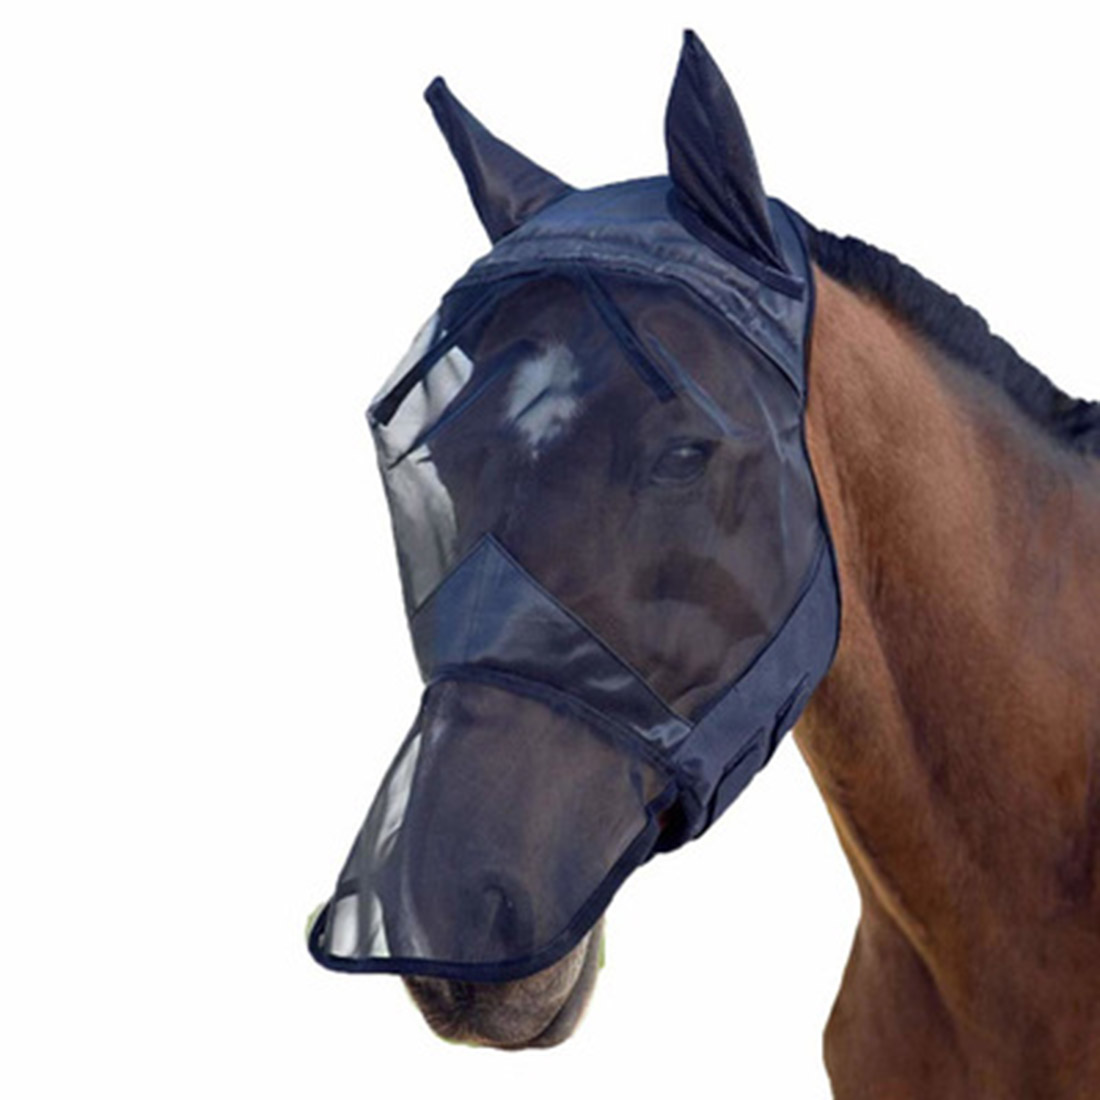 Equestrian Horse Fly Mask Full Face Mesh Fleece Padded Anti-UV Protection